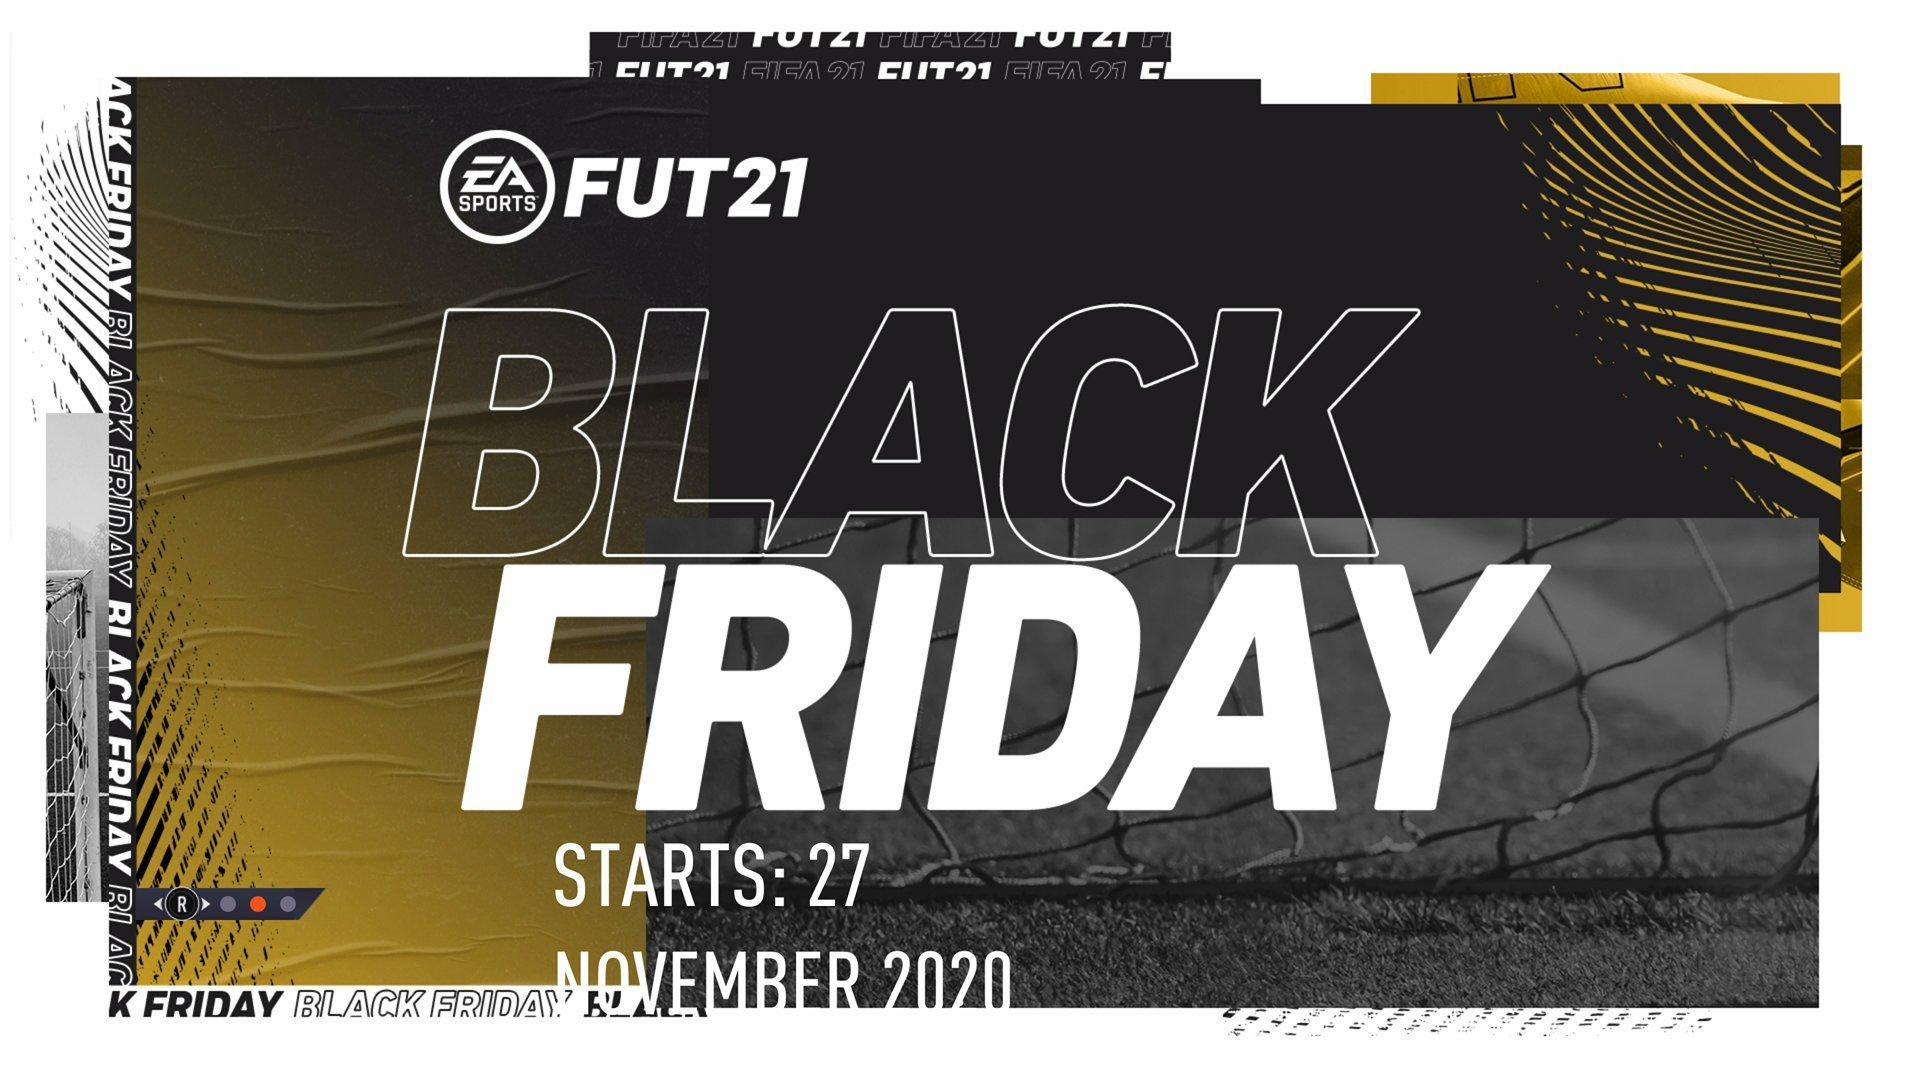 FIFA 21 Black Friday 2020